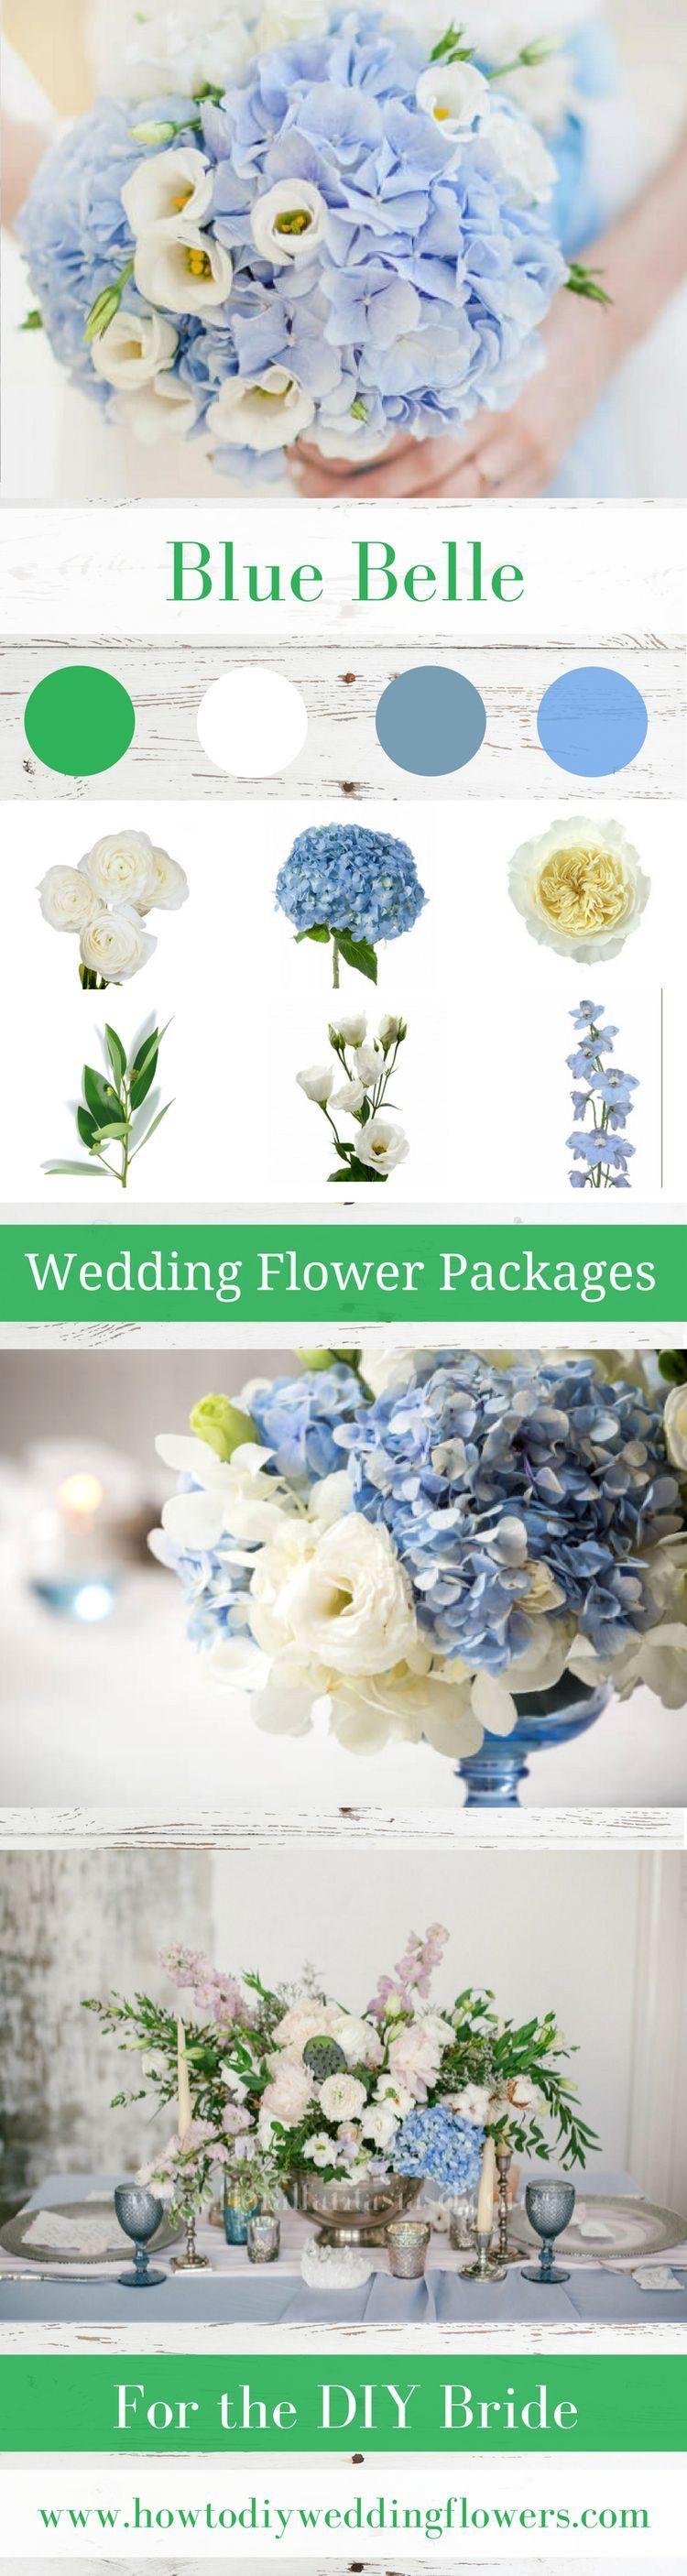 Wedding Trends  How to DIY Wedding Flowers DIY Flowers